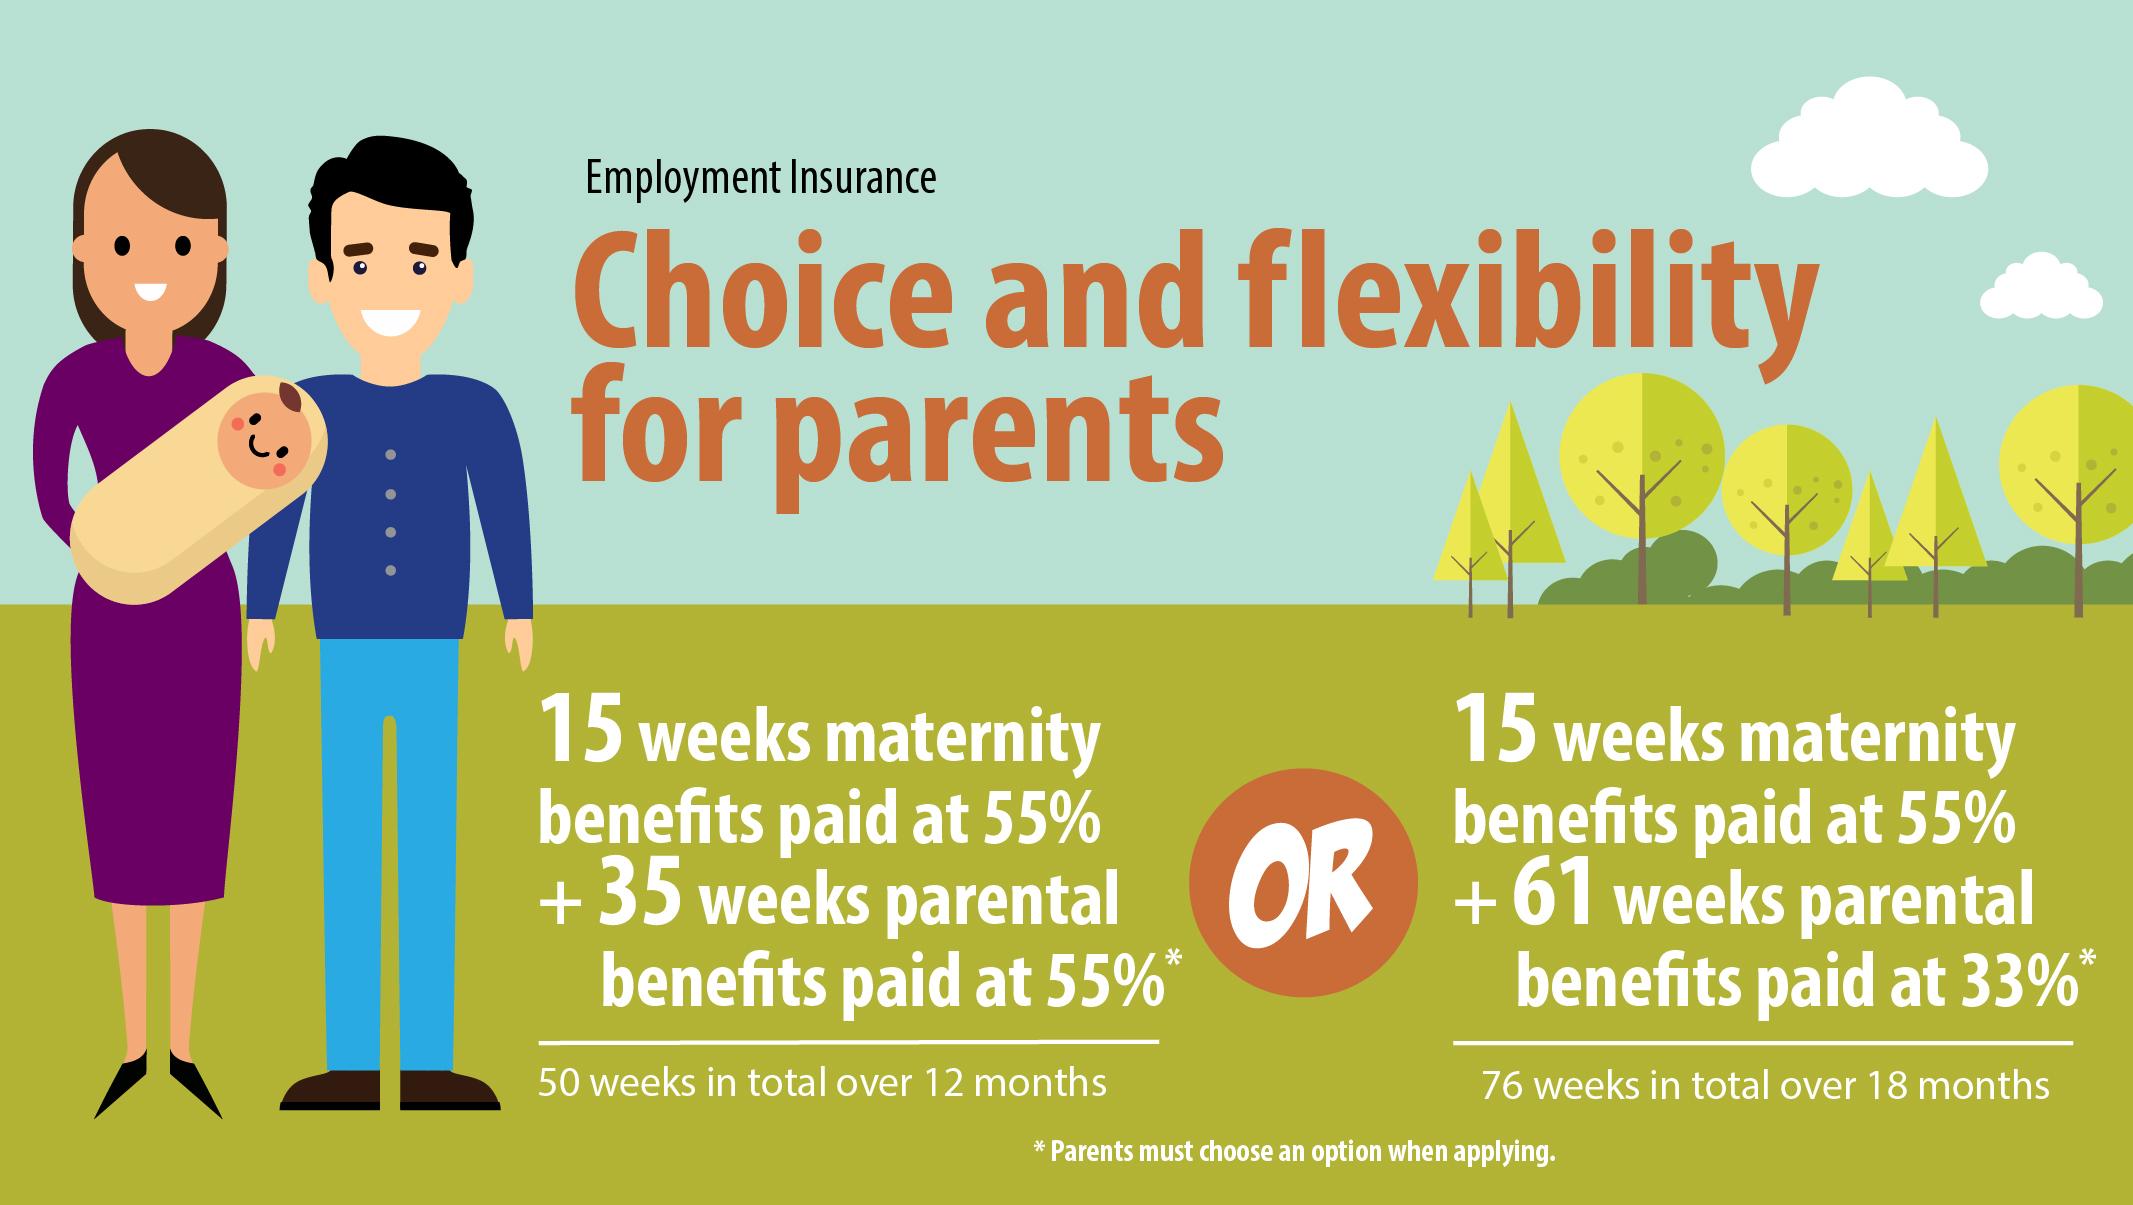 18 month parental leave start date